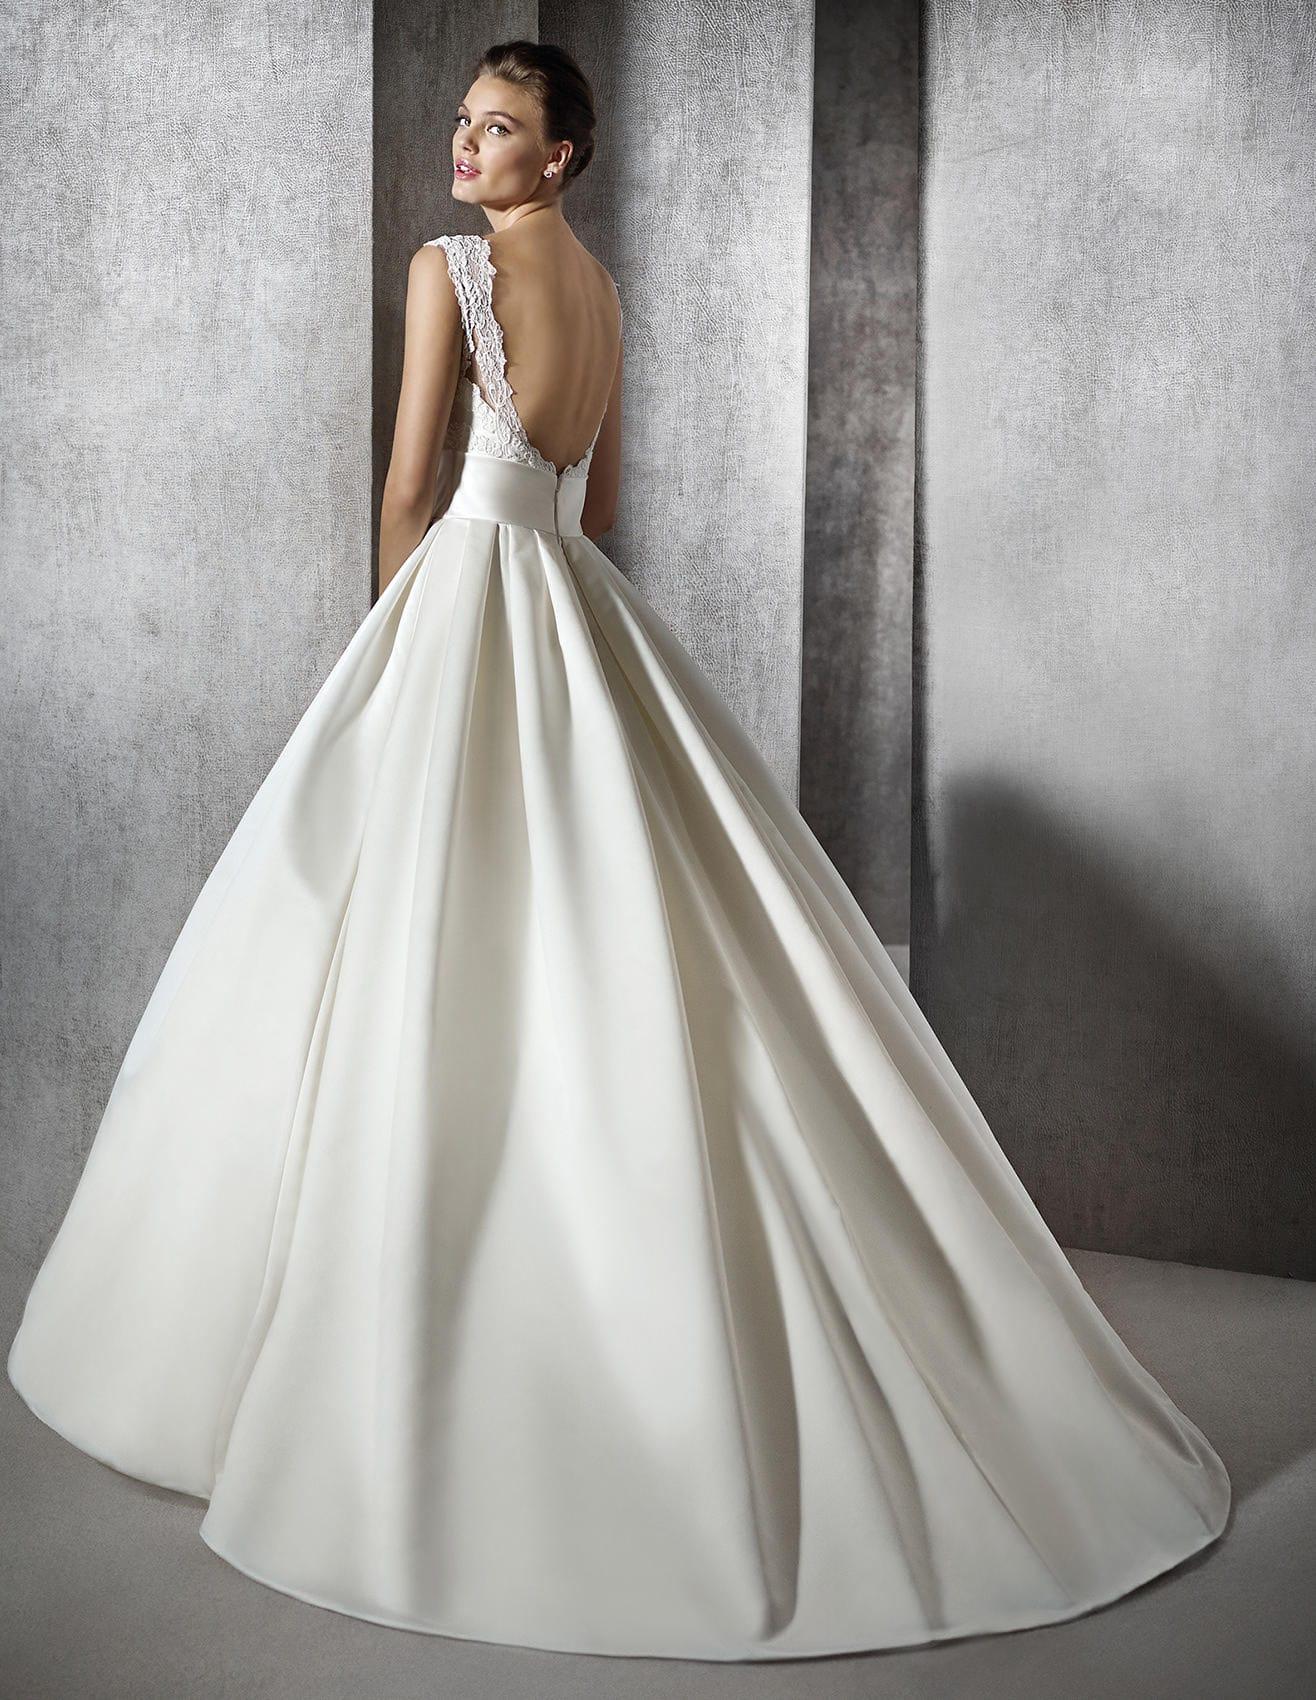 Wedding Dress Zerelda St Patrick Boutique Paris